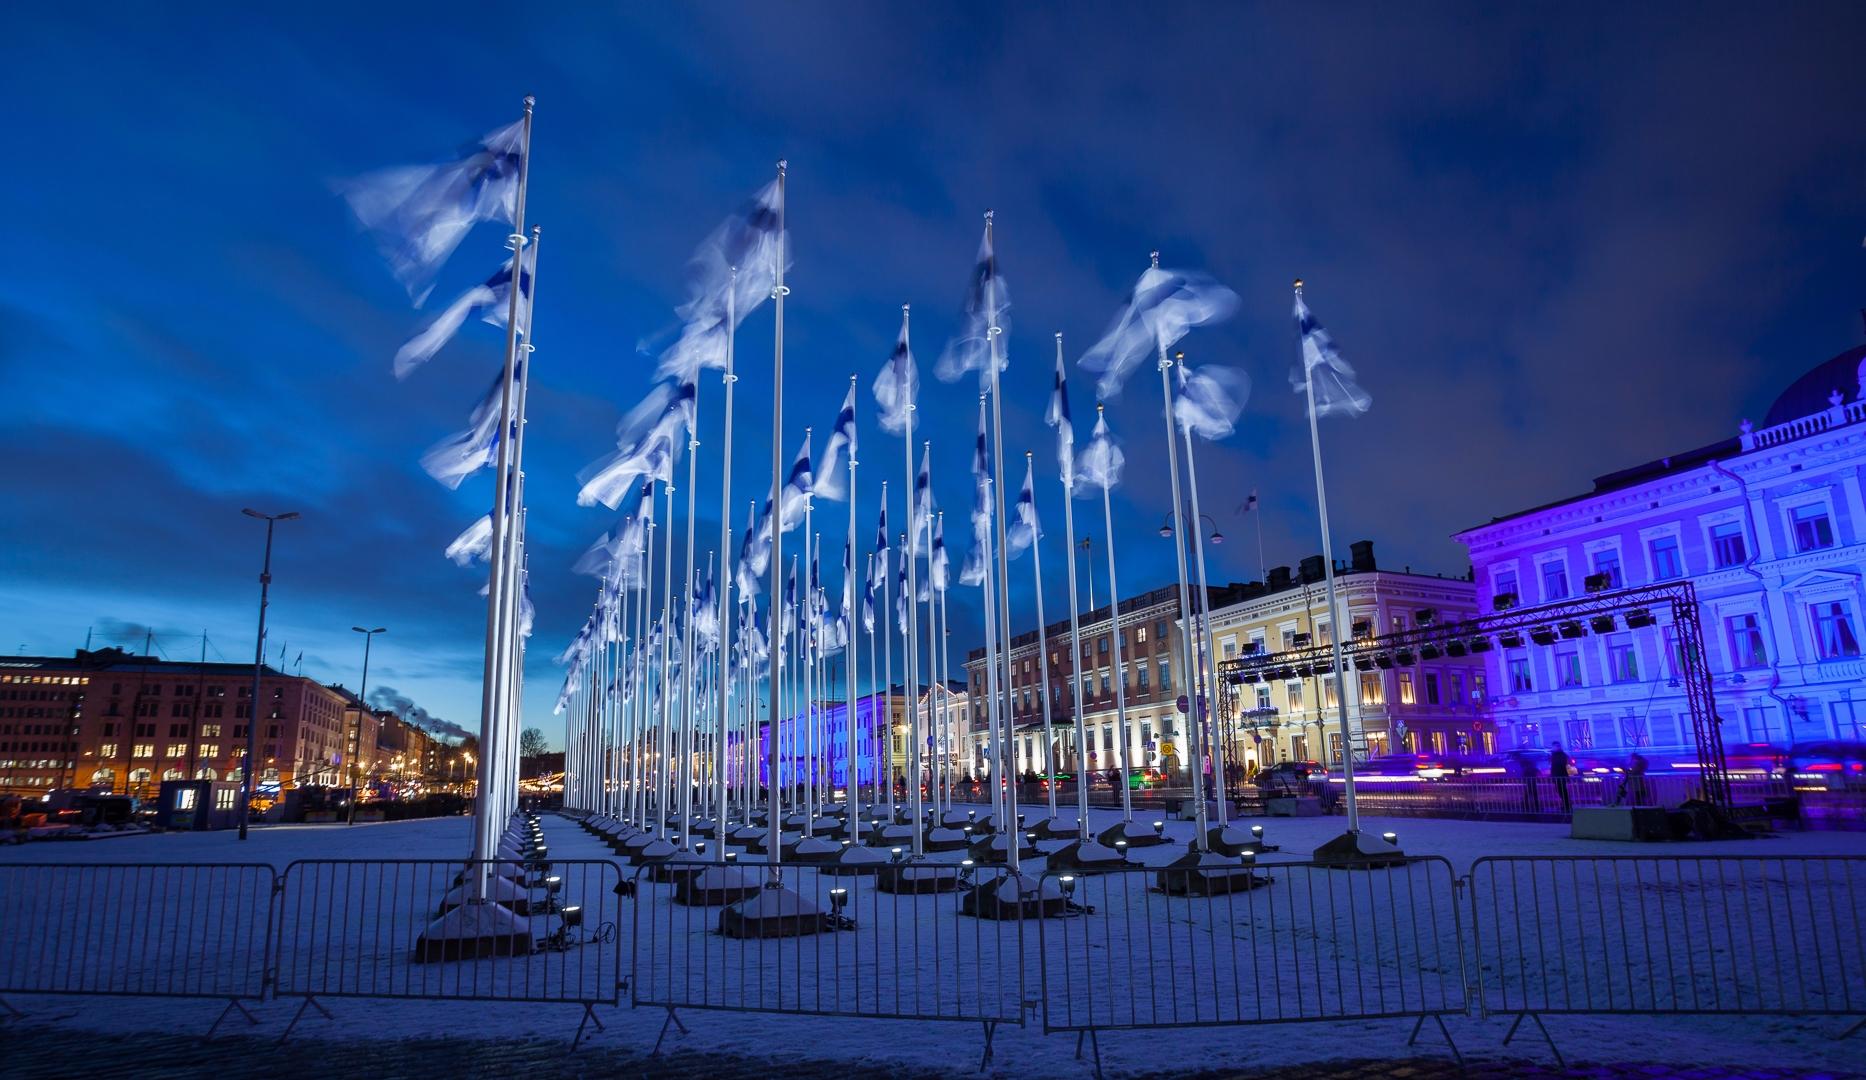 Finland 100 - photography, landscape - anttitassberg | ello